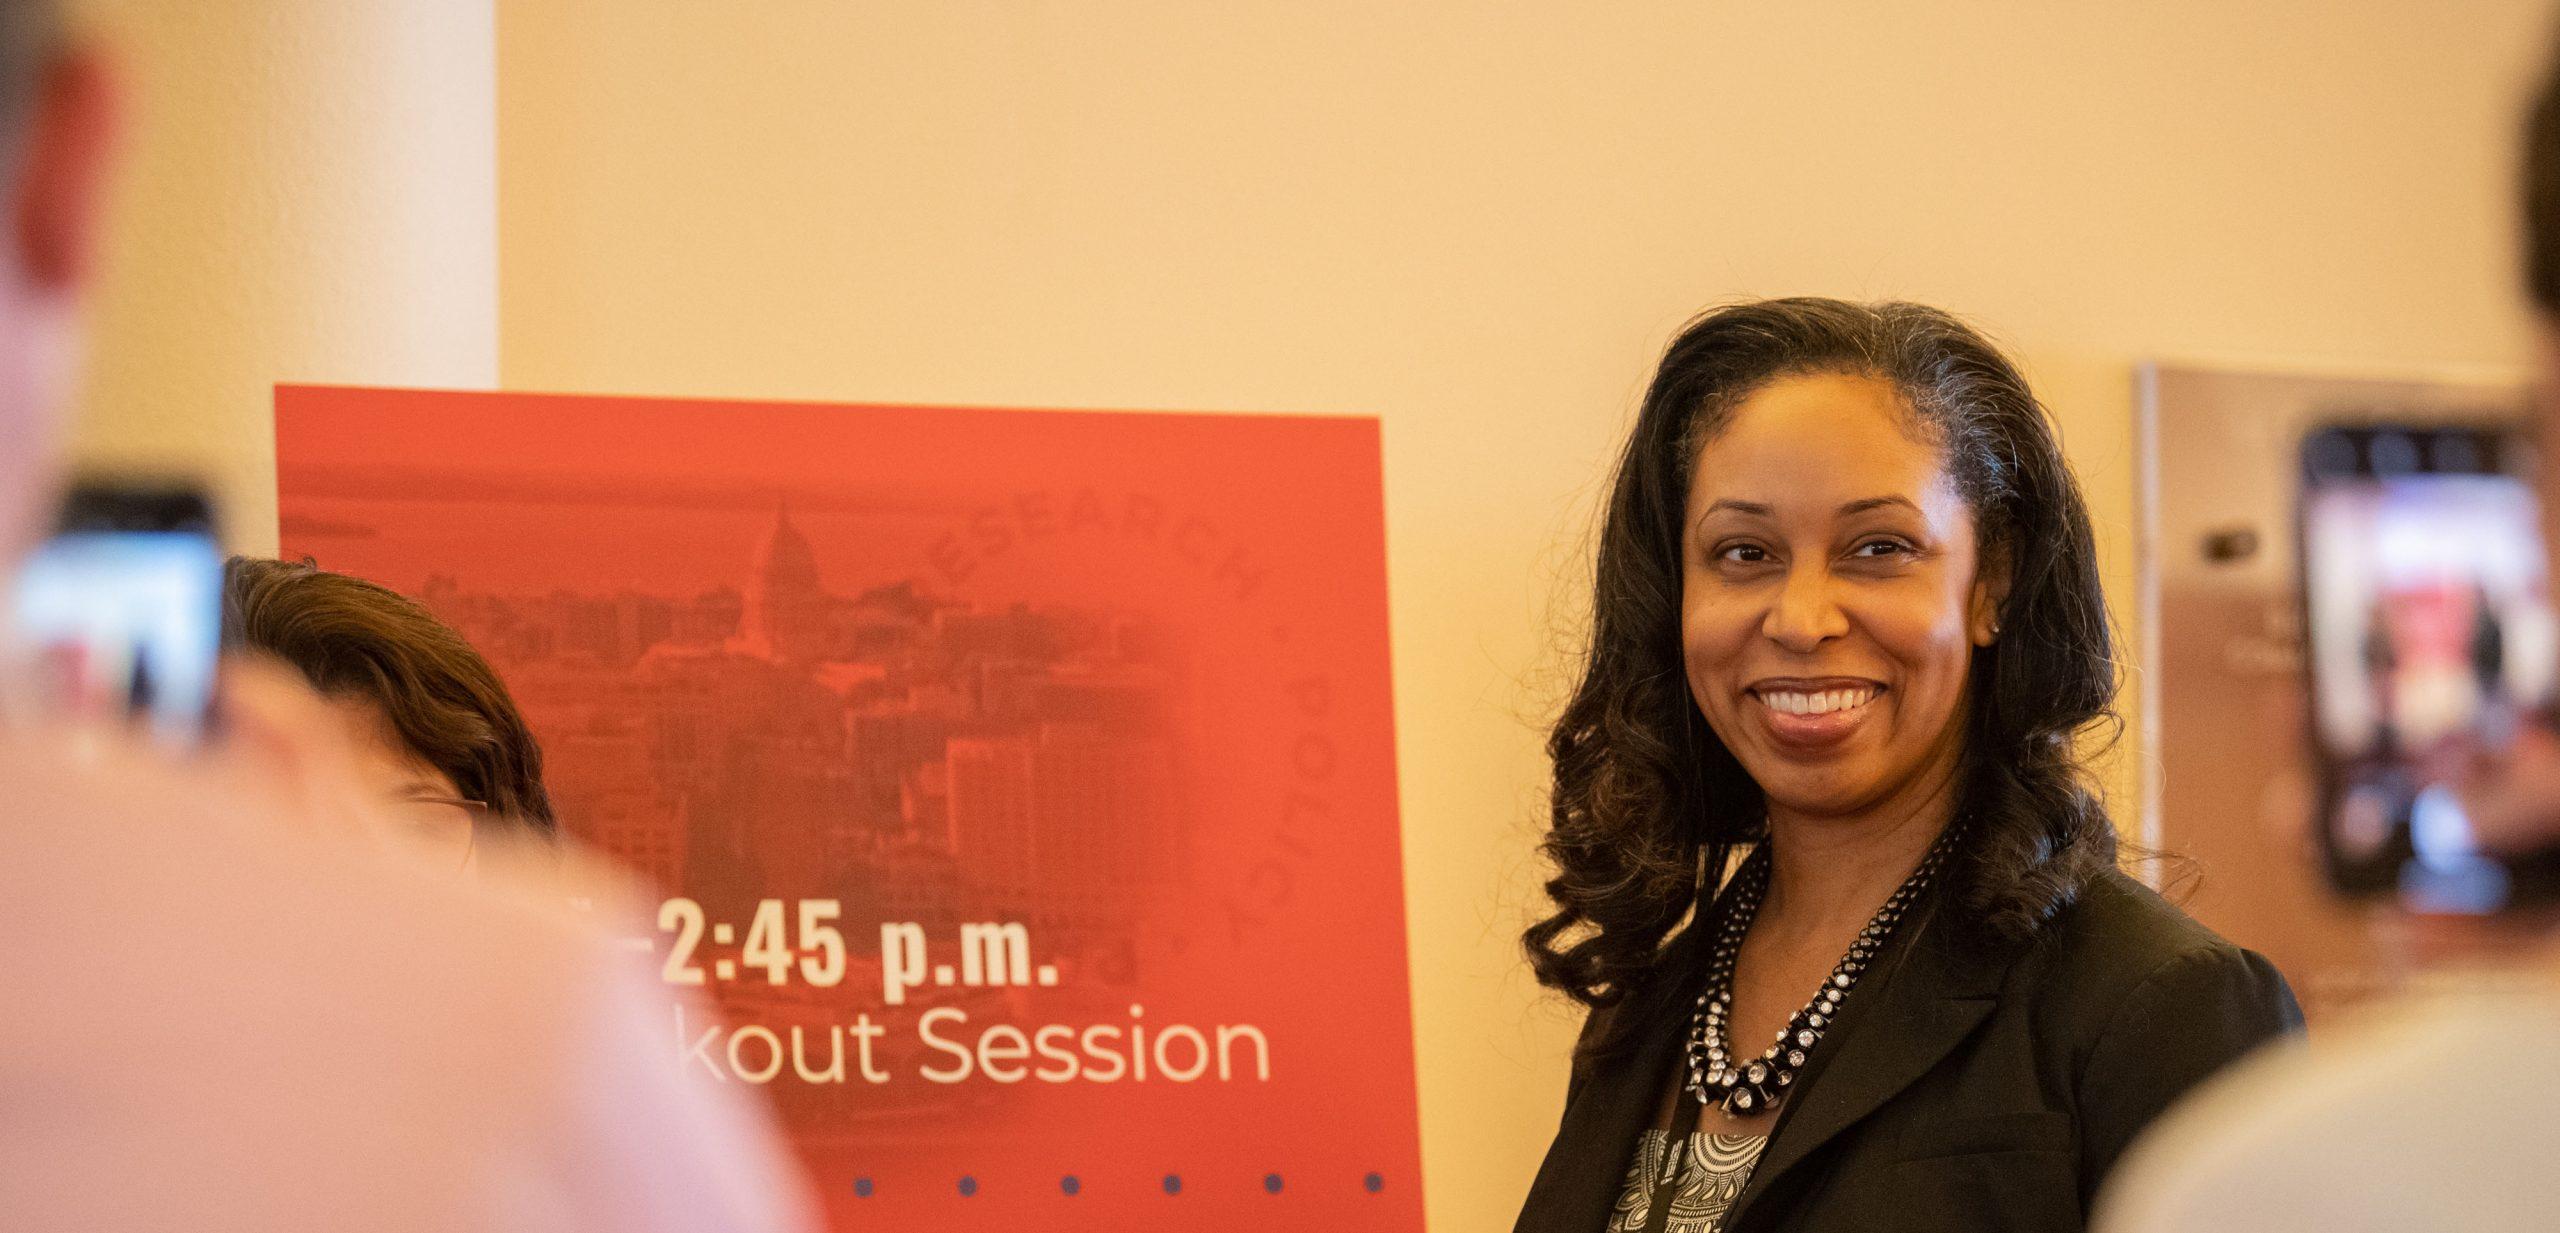 Assistant Director Christina Orr of the Milwaukee VA Medical Center.